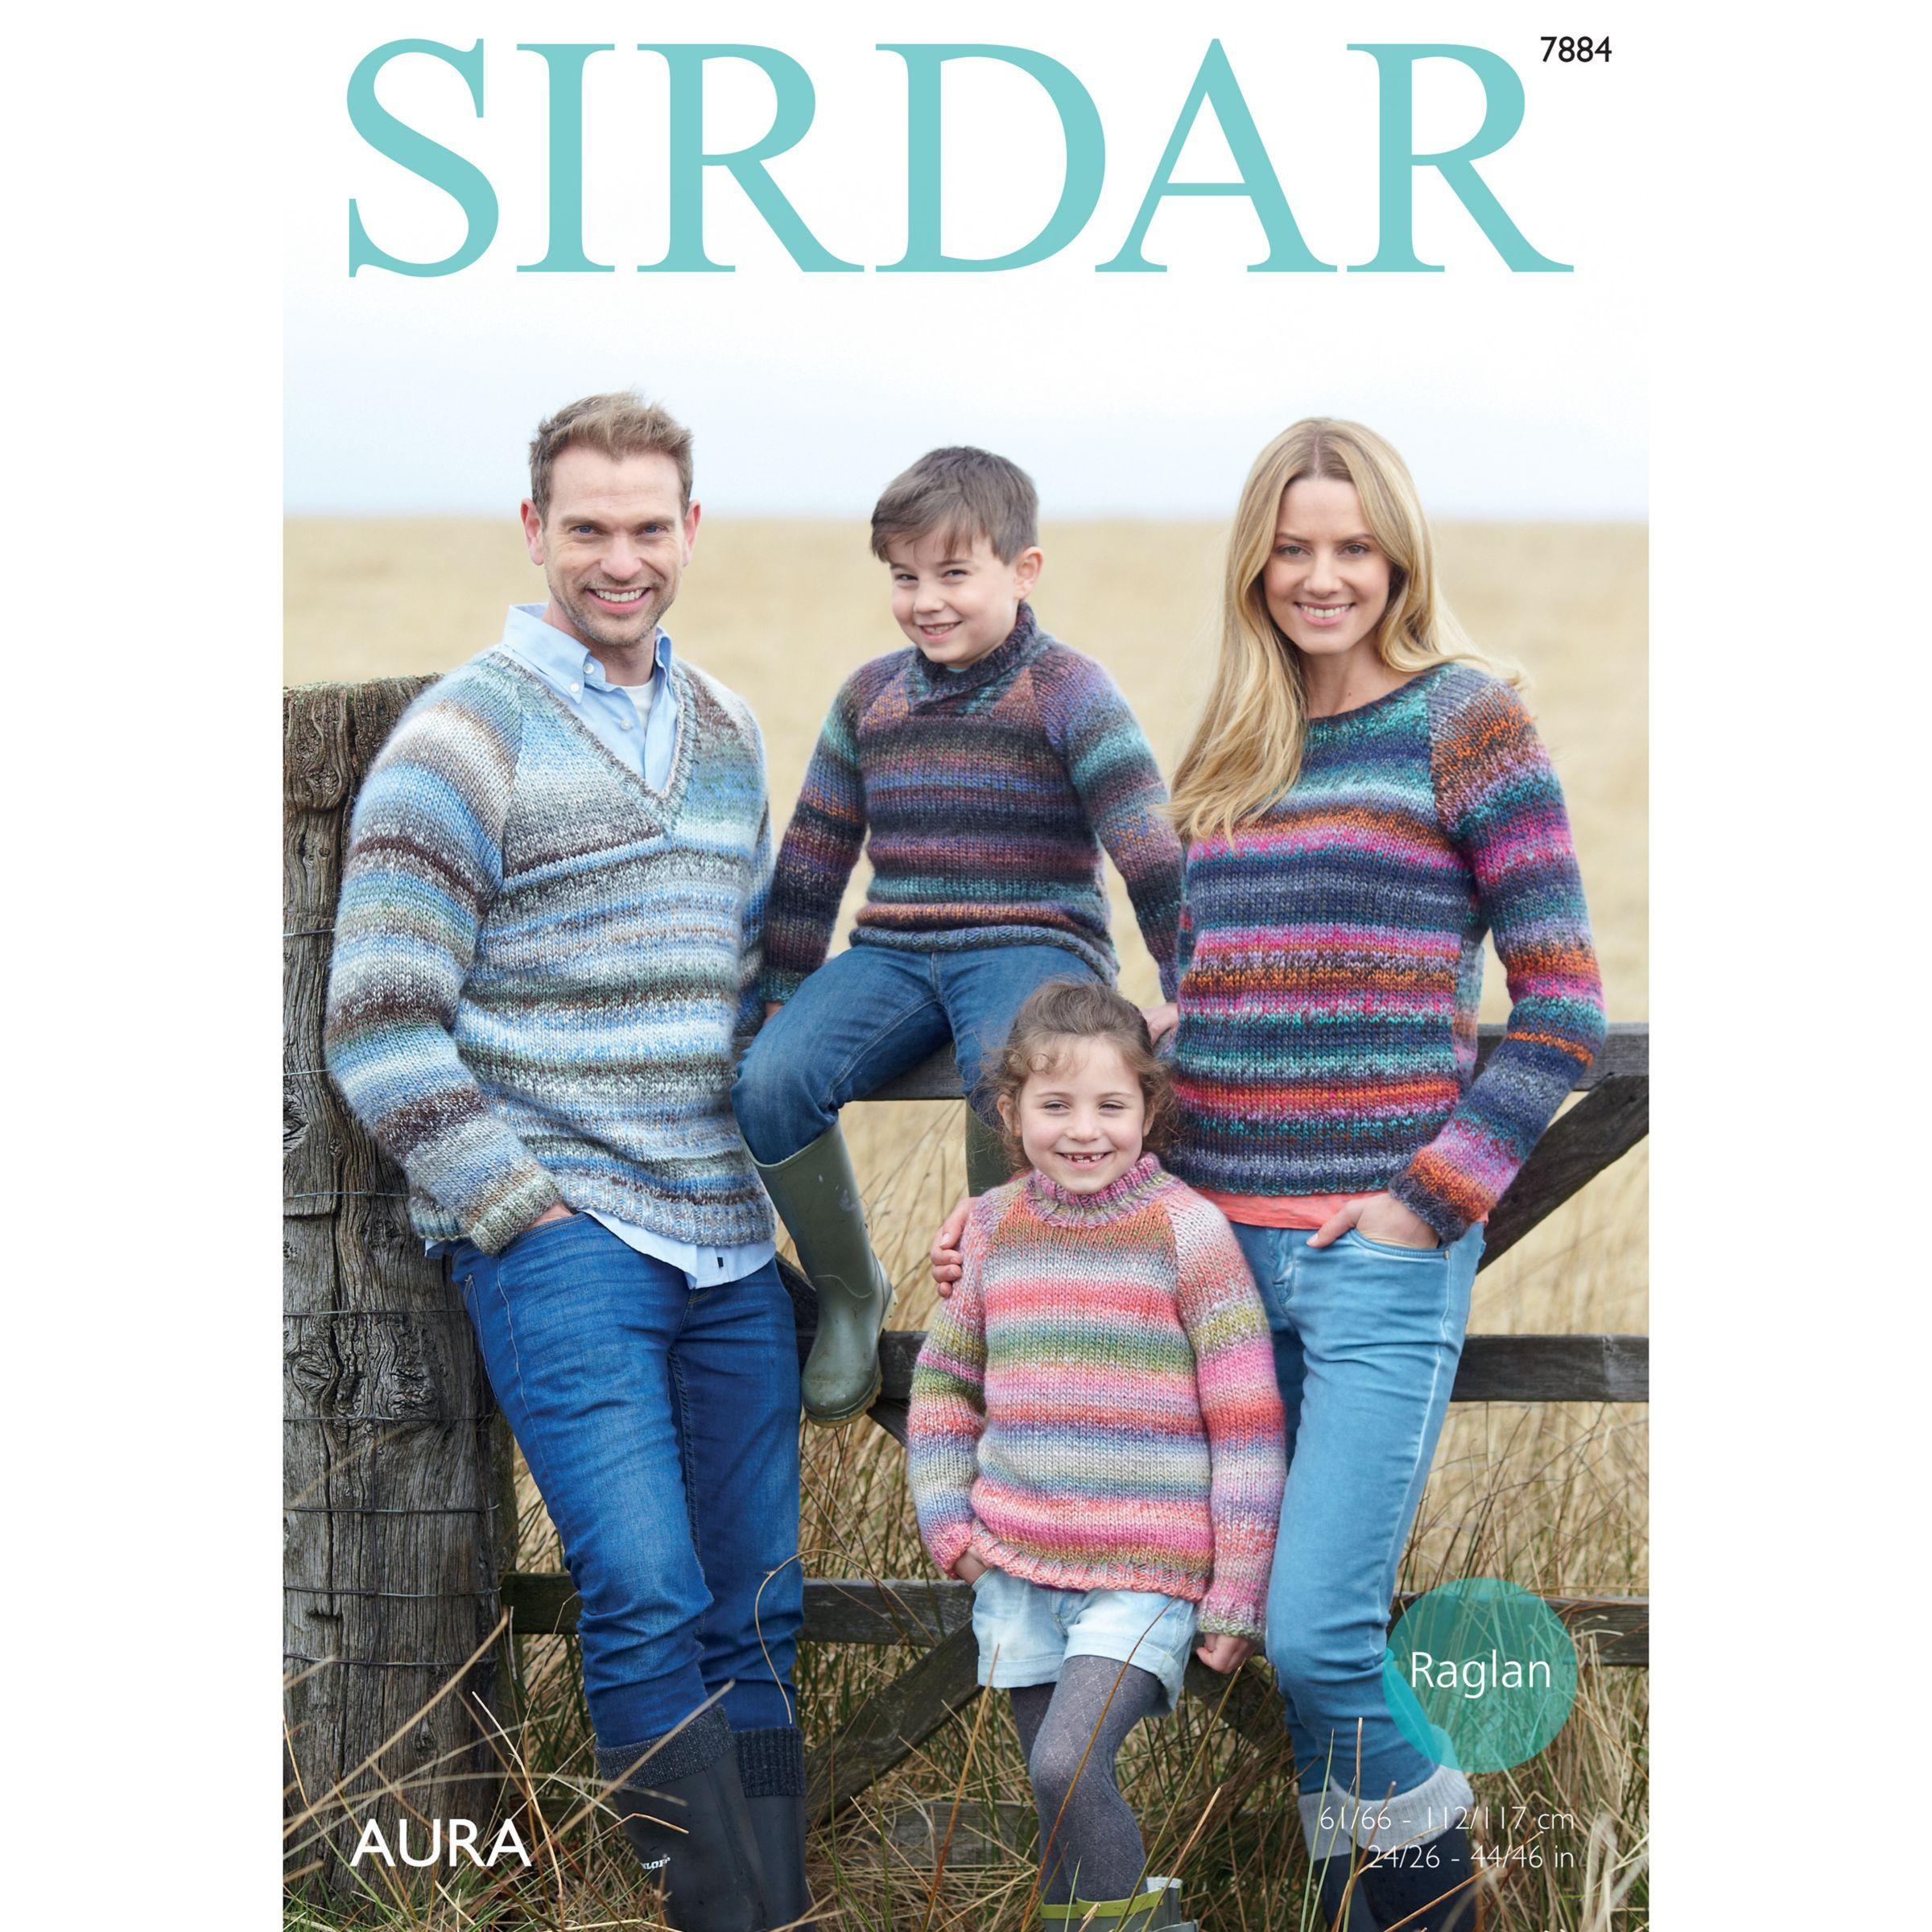 Sirdar Sirdar Aura Chunky Jumpers Knitting Pattern, 7884